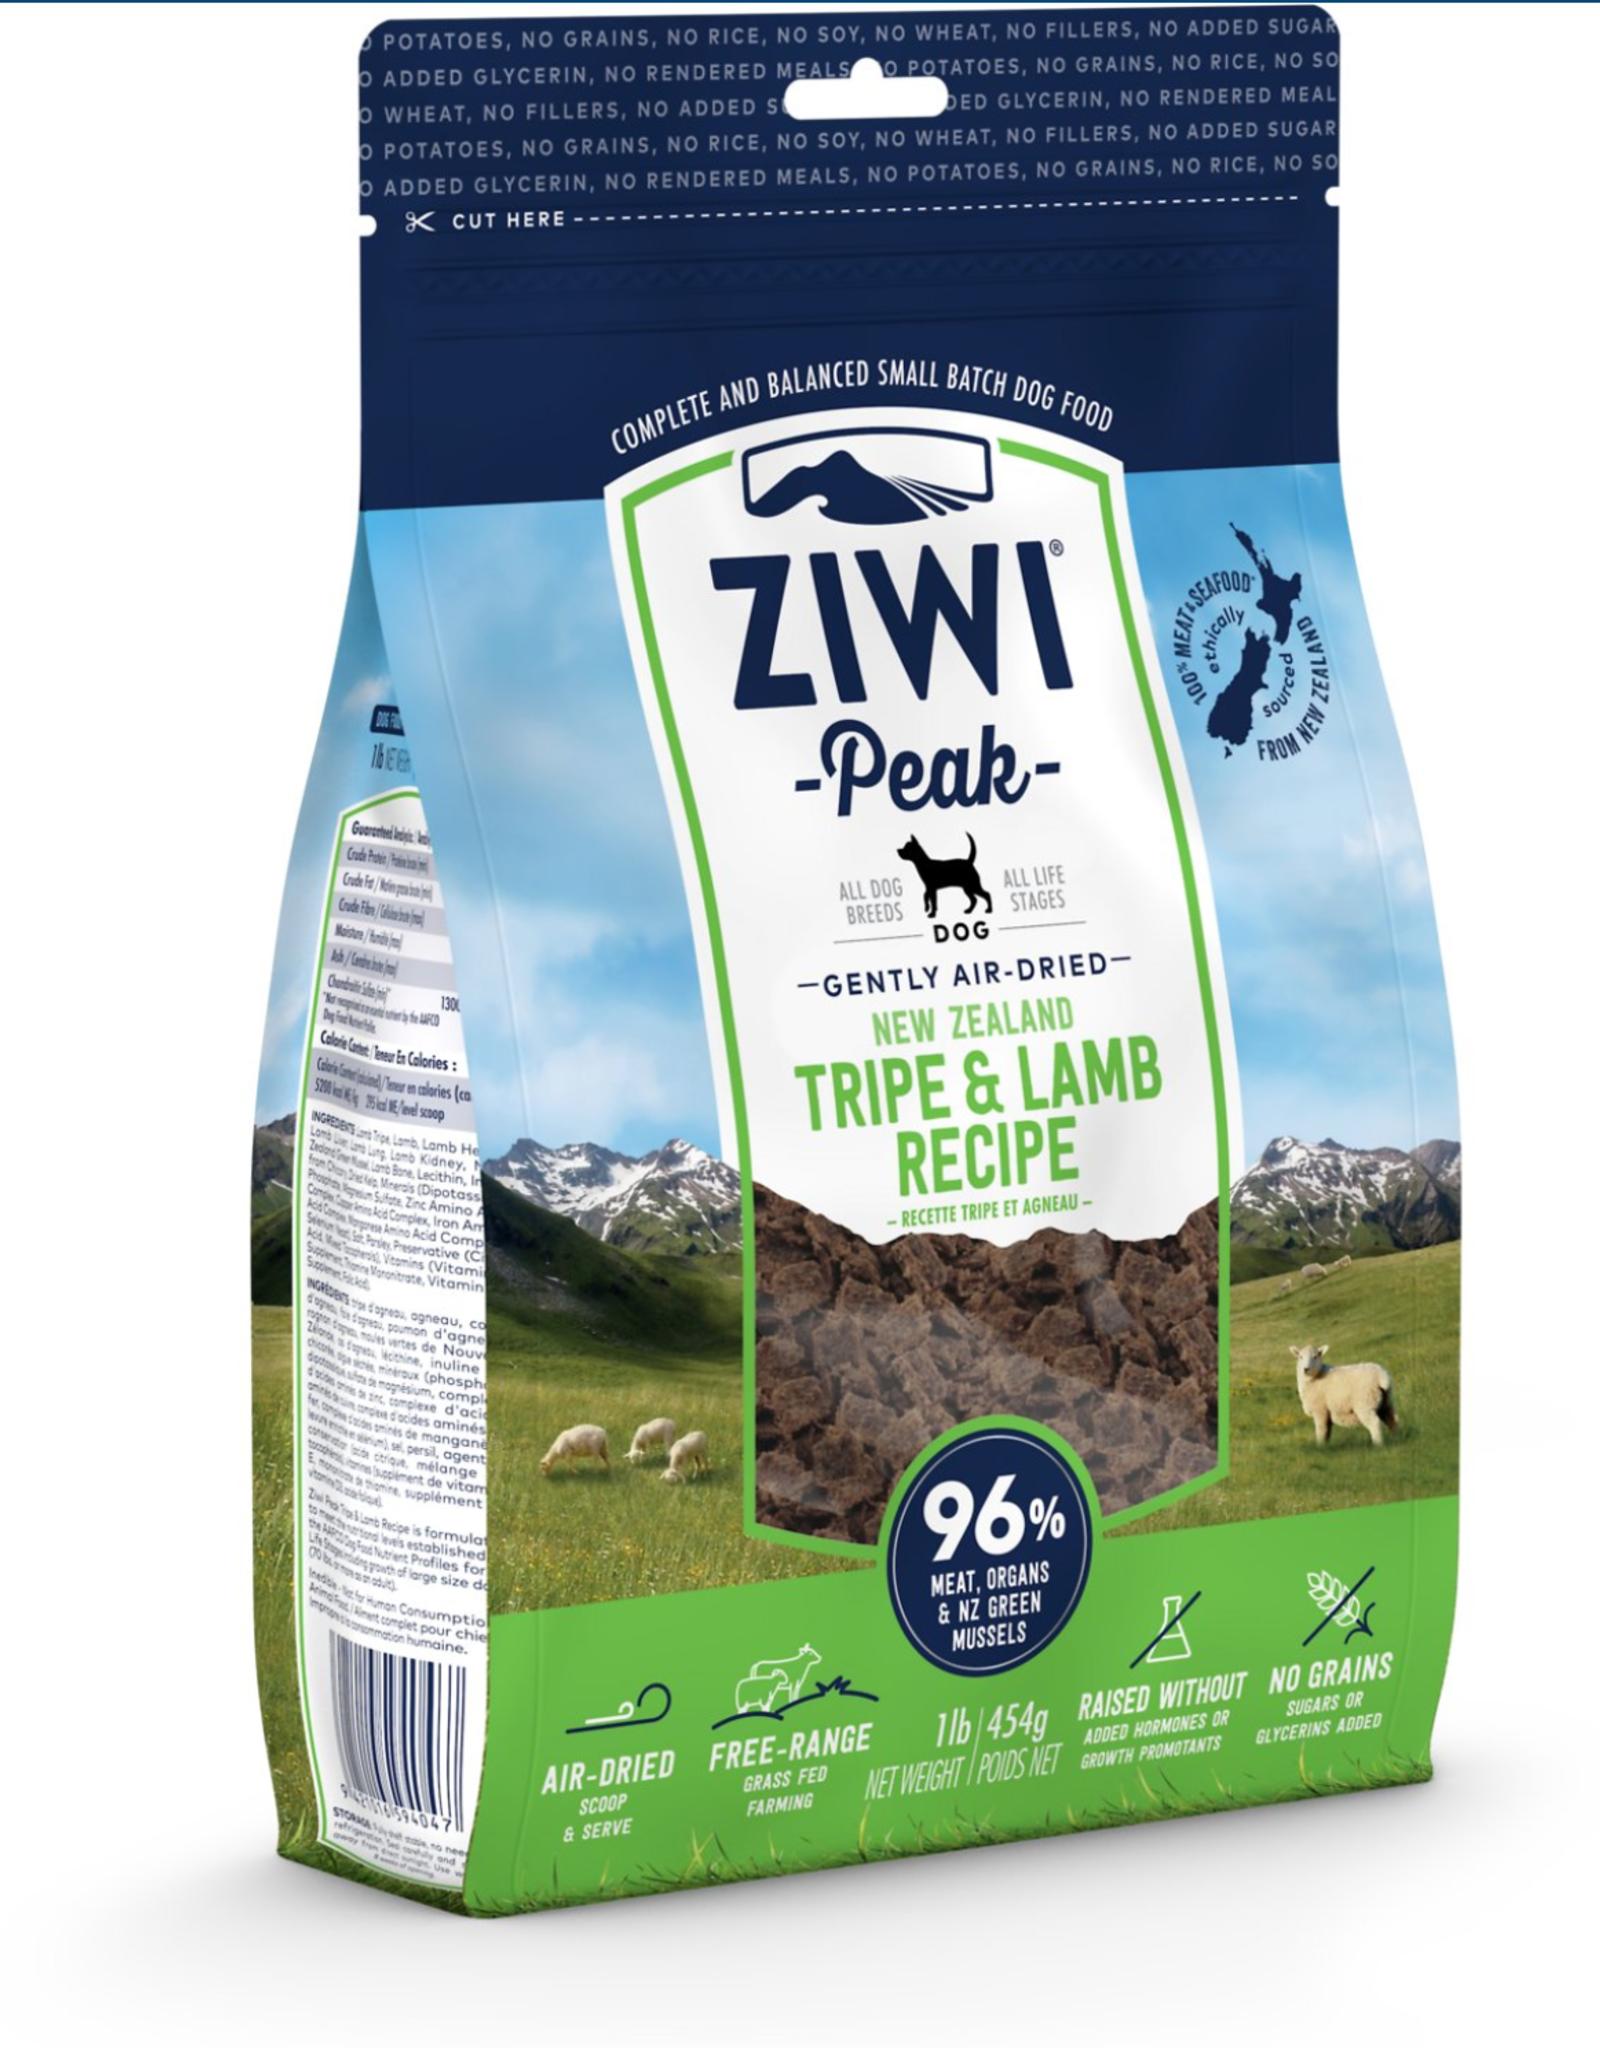 Ziwi Ziwi Peak - Dog Food - Tripe & Lamb Flavored - 16oz